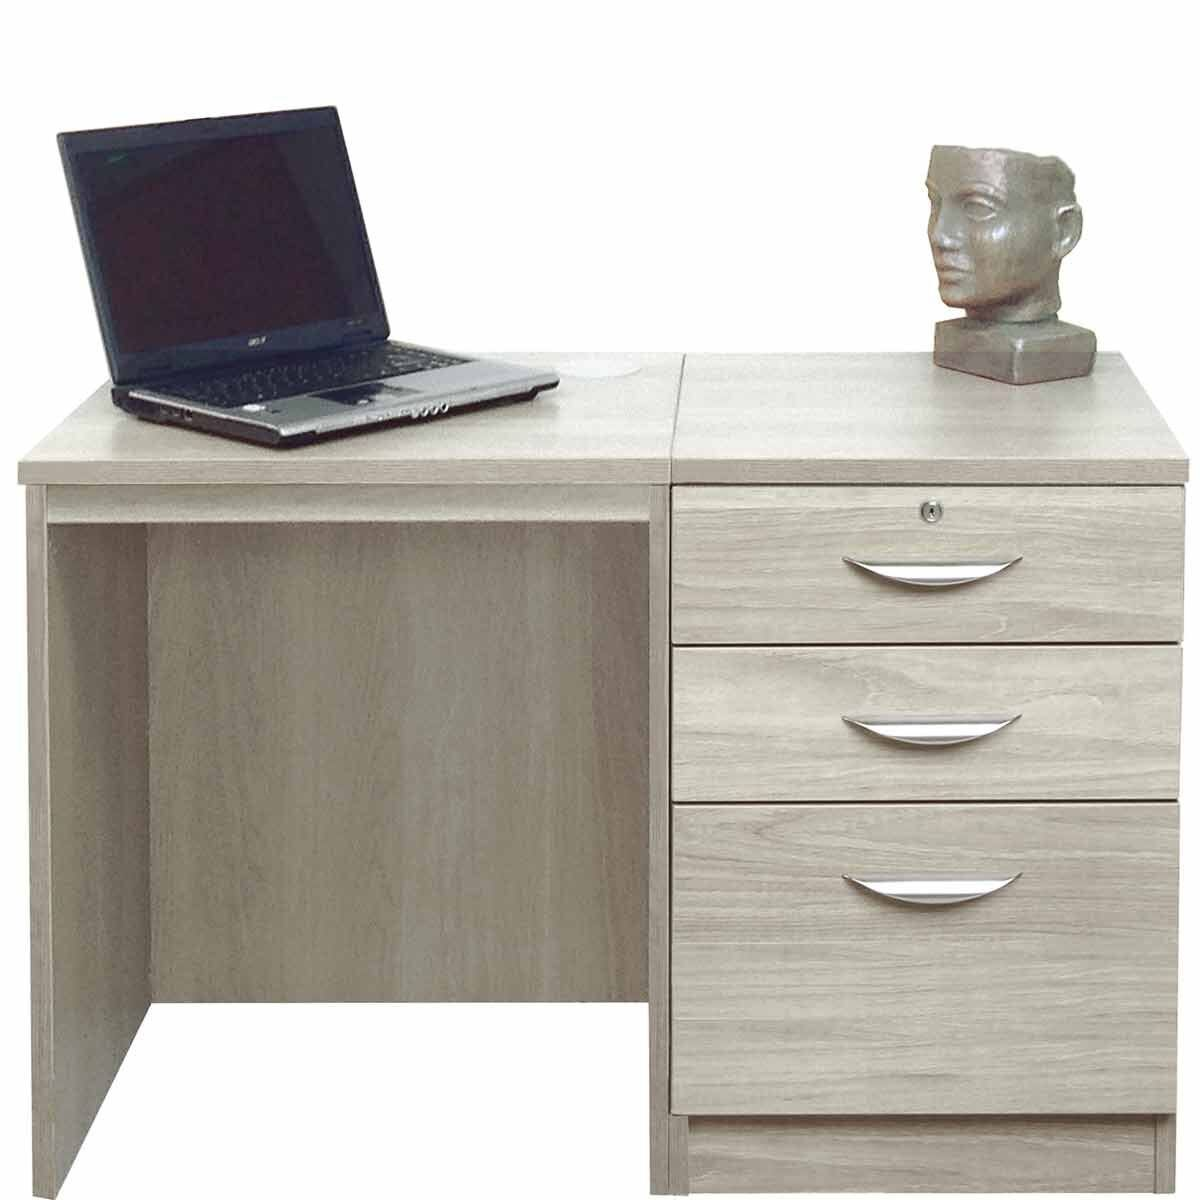 R White Home Office Desk Set with Drawers Grey Nebraska